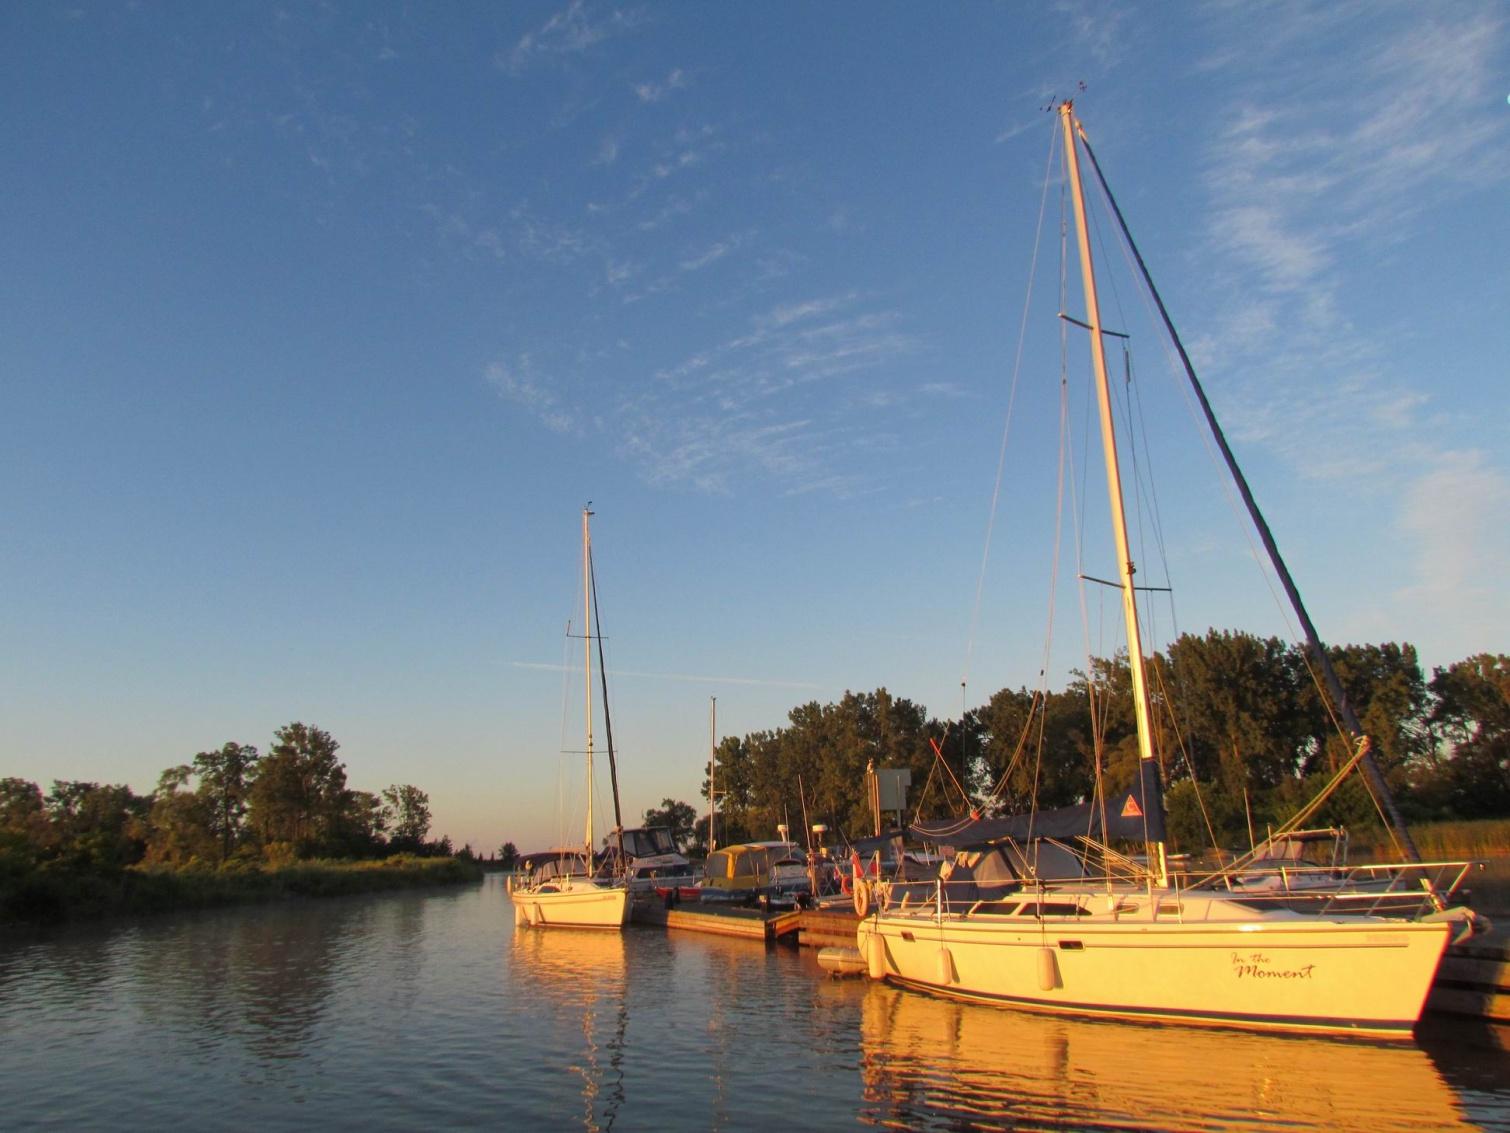 Click image for larger version  Name:wellington harbour.jpg Views:196 Size:411.5 KB ID:96160